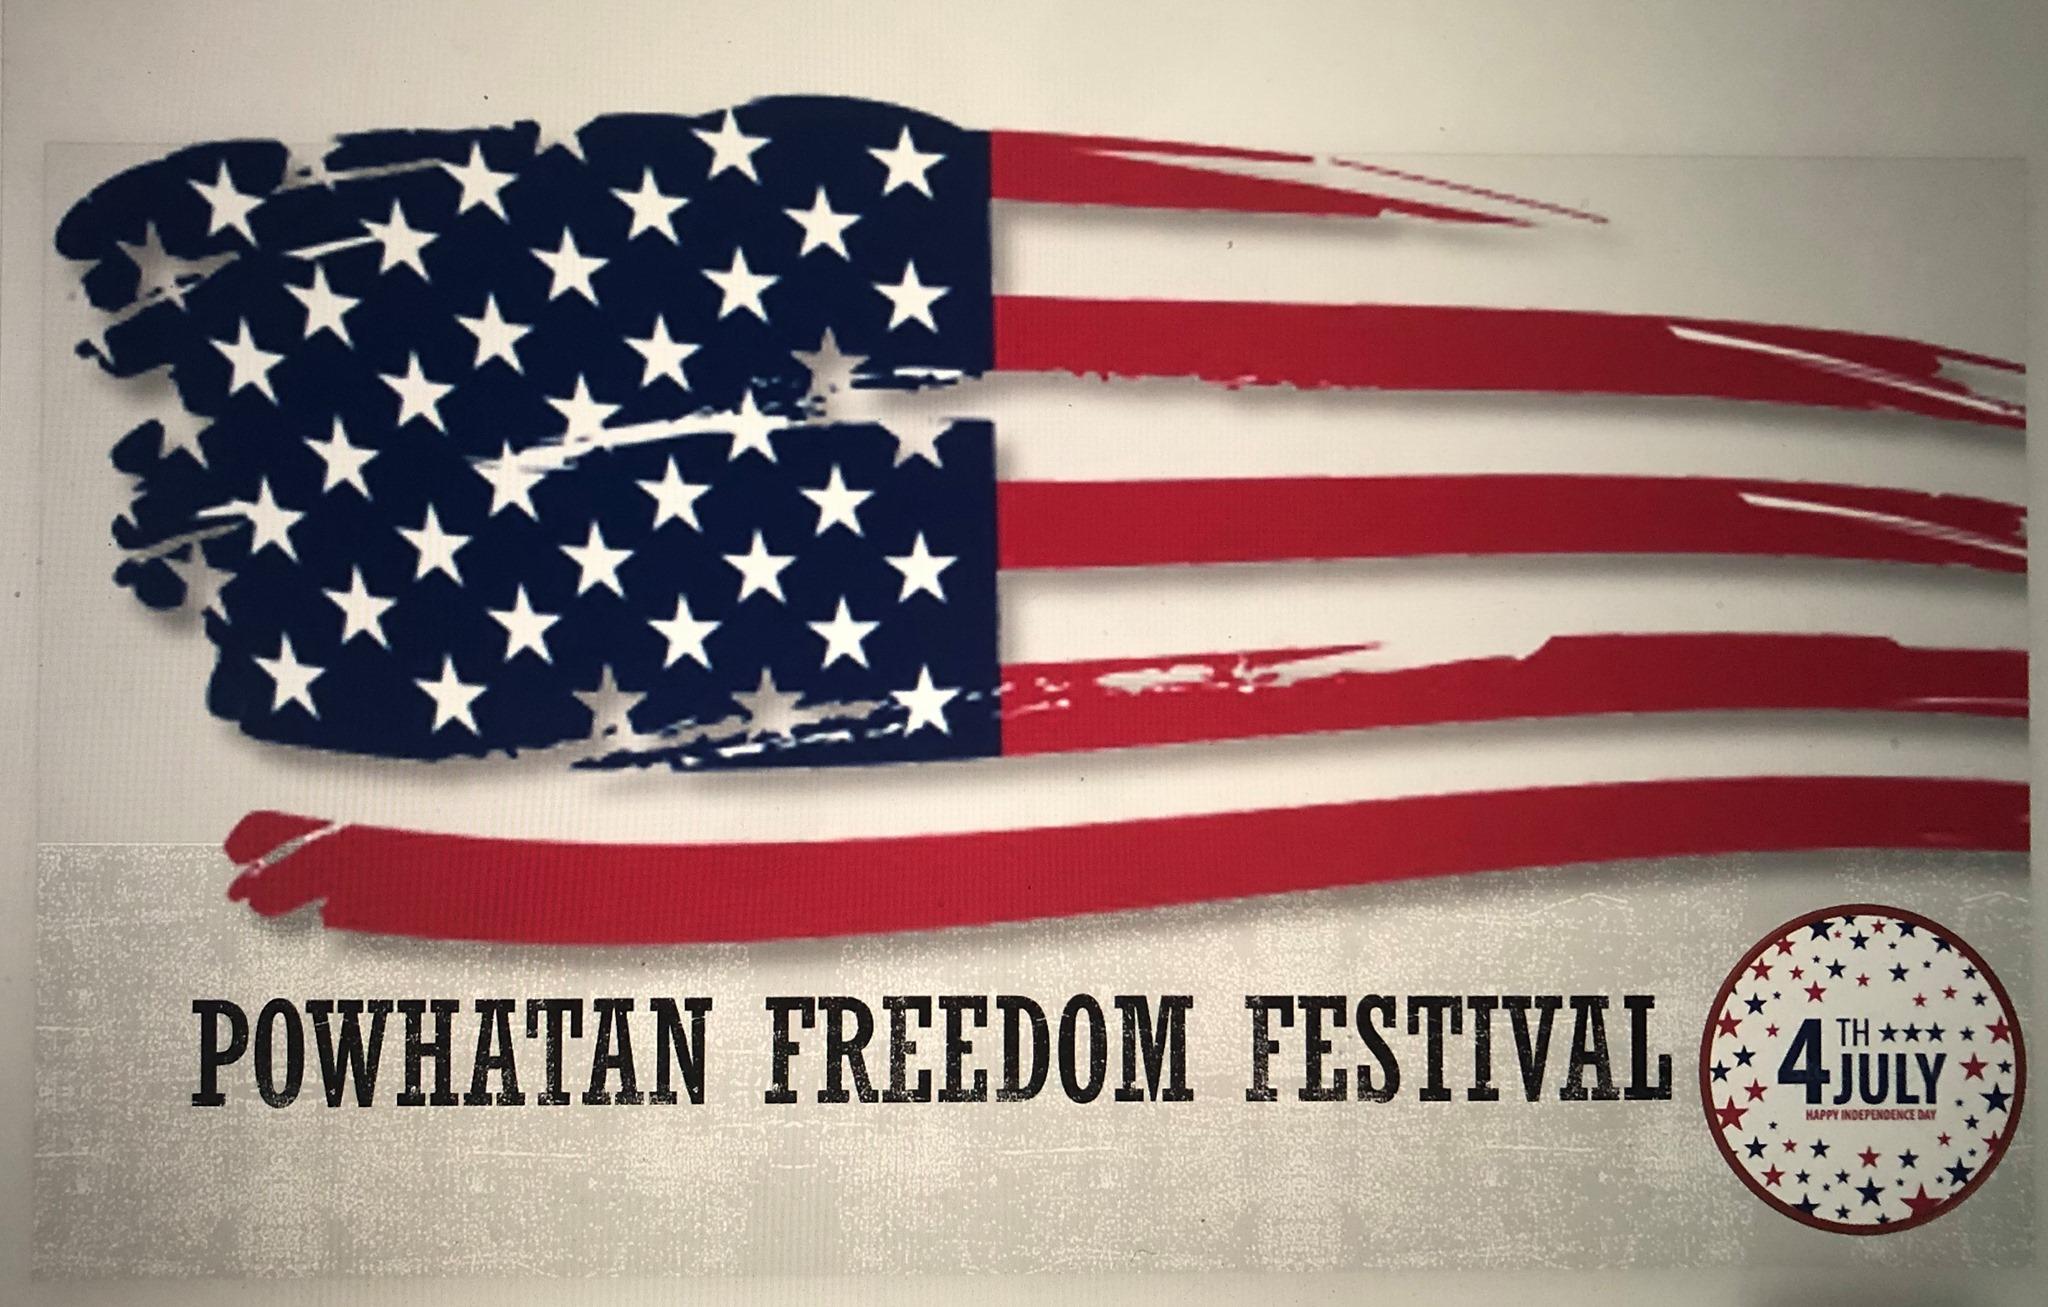 Powhatan Freedom Festival